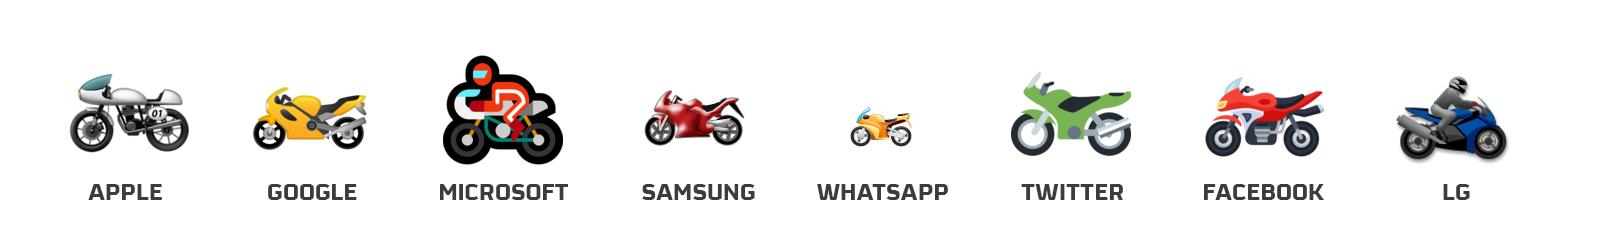 emojis moto R